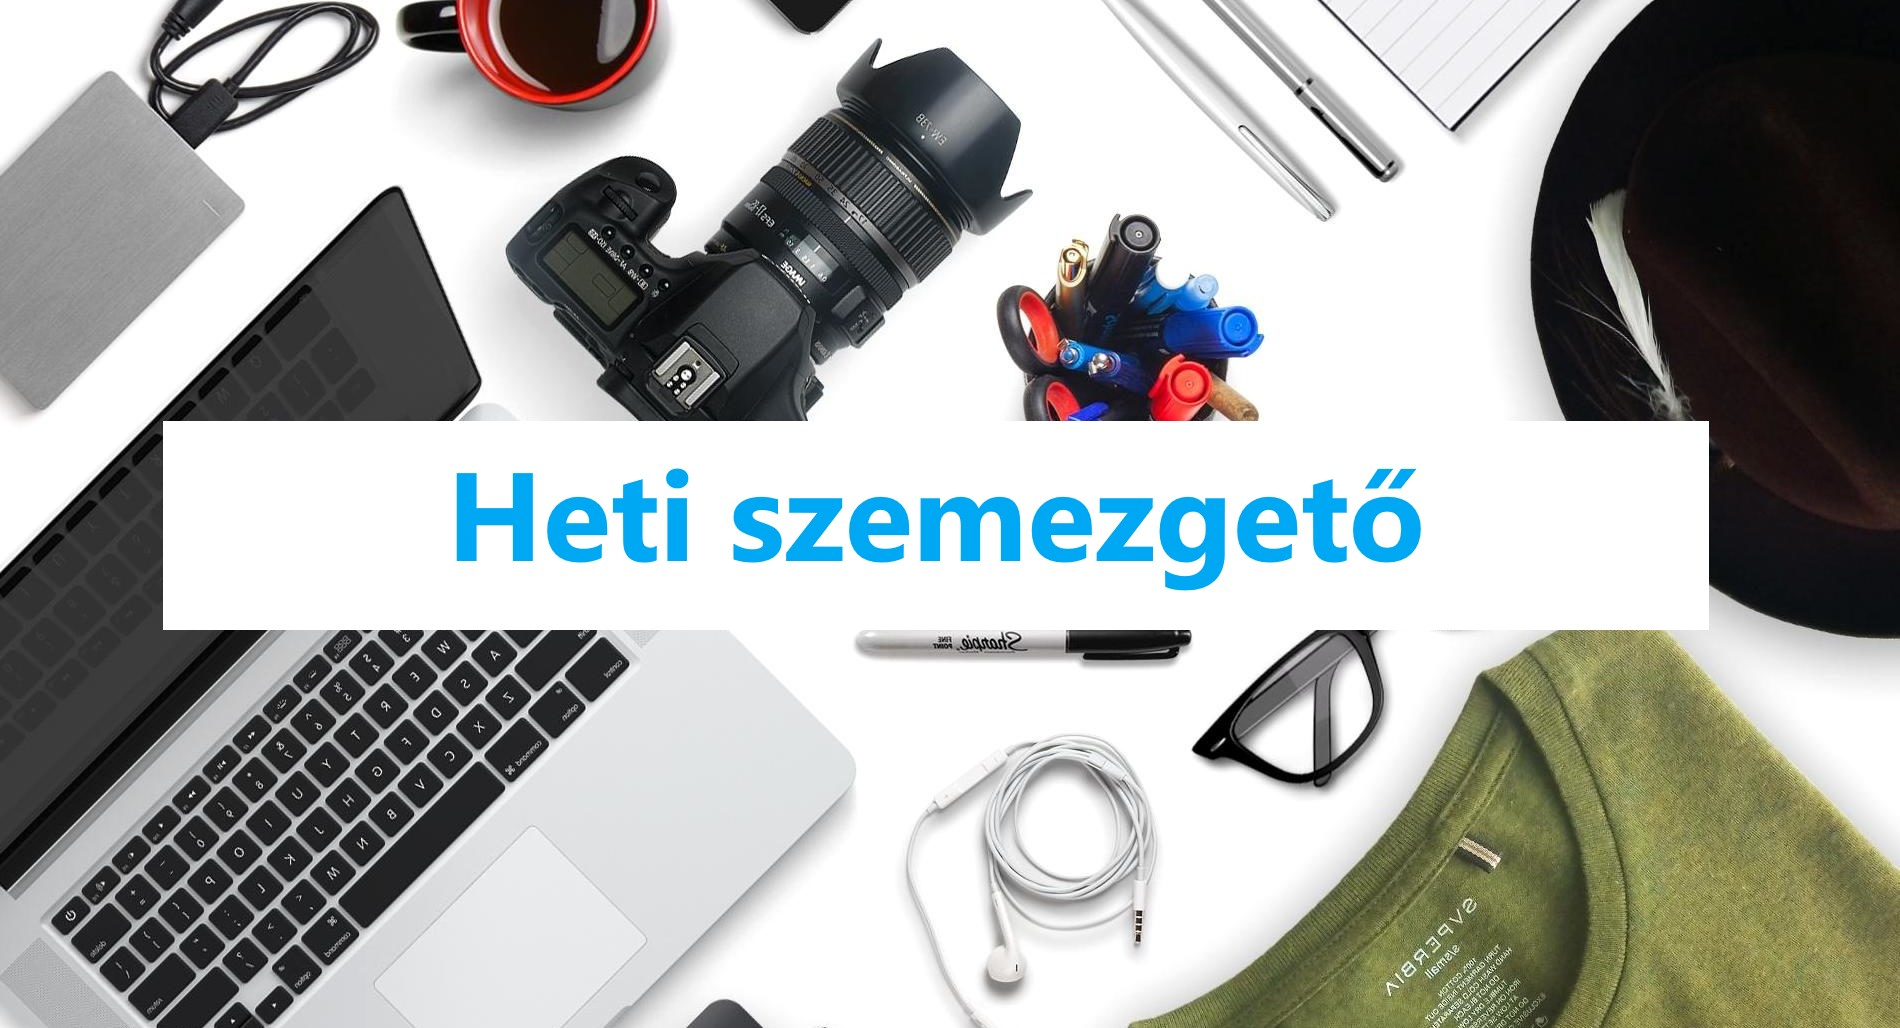 heti_szemezgeto_uj_62.jpg